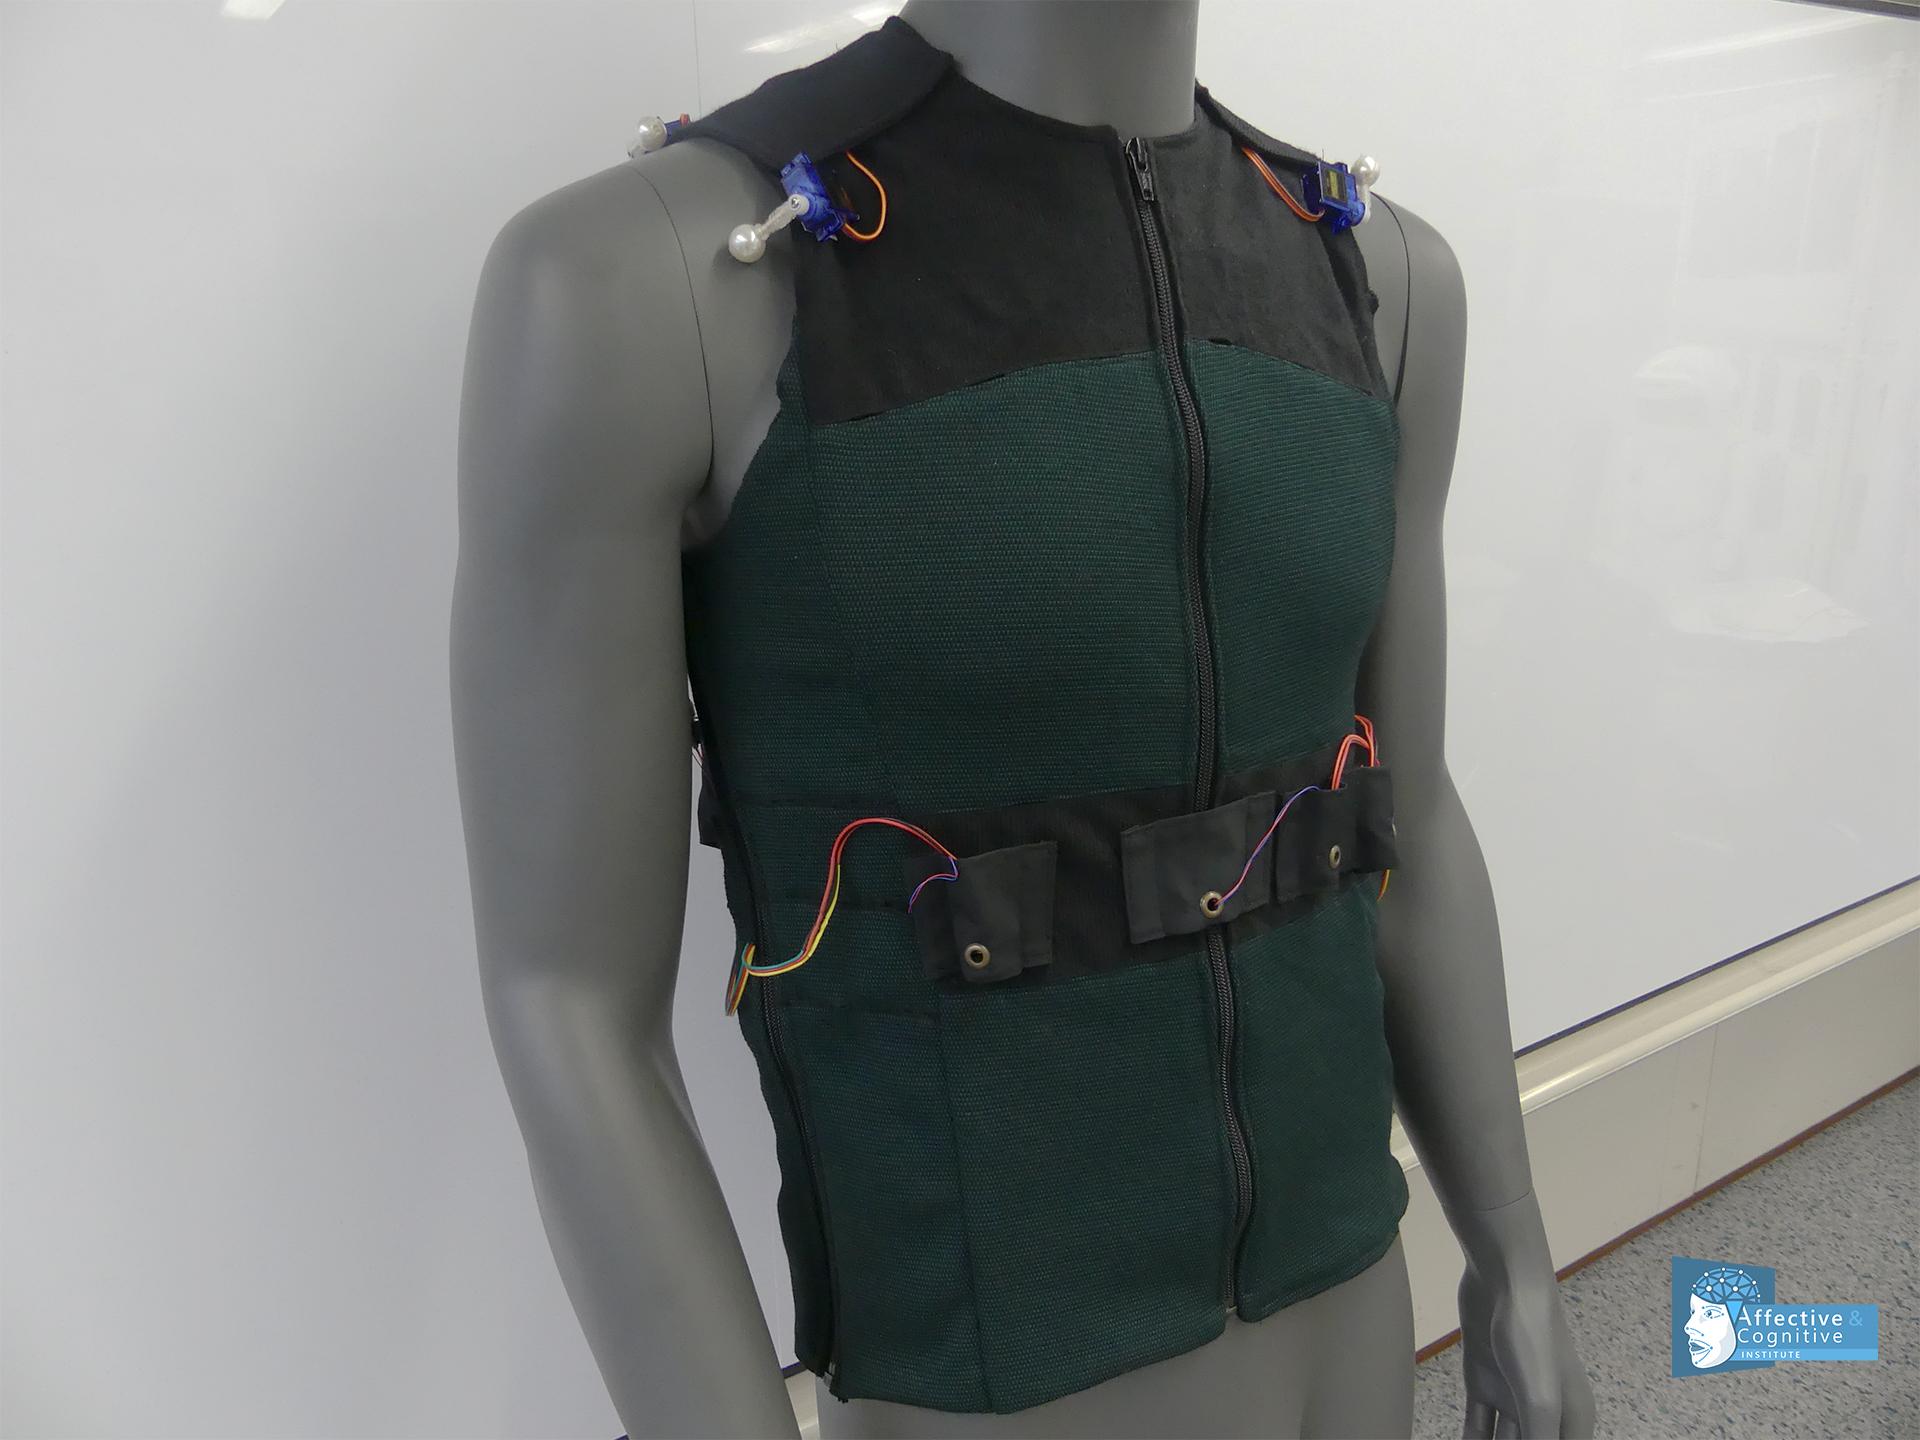 Garment Vest Prototype of SUITCEYES